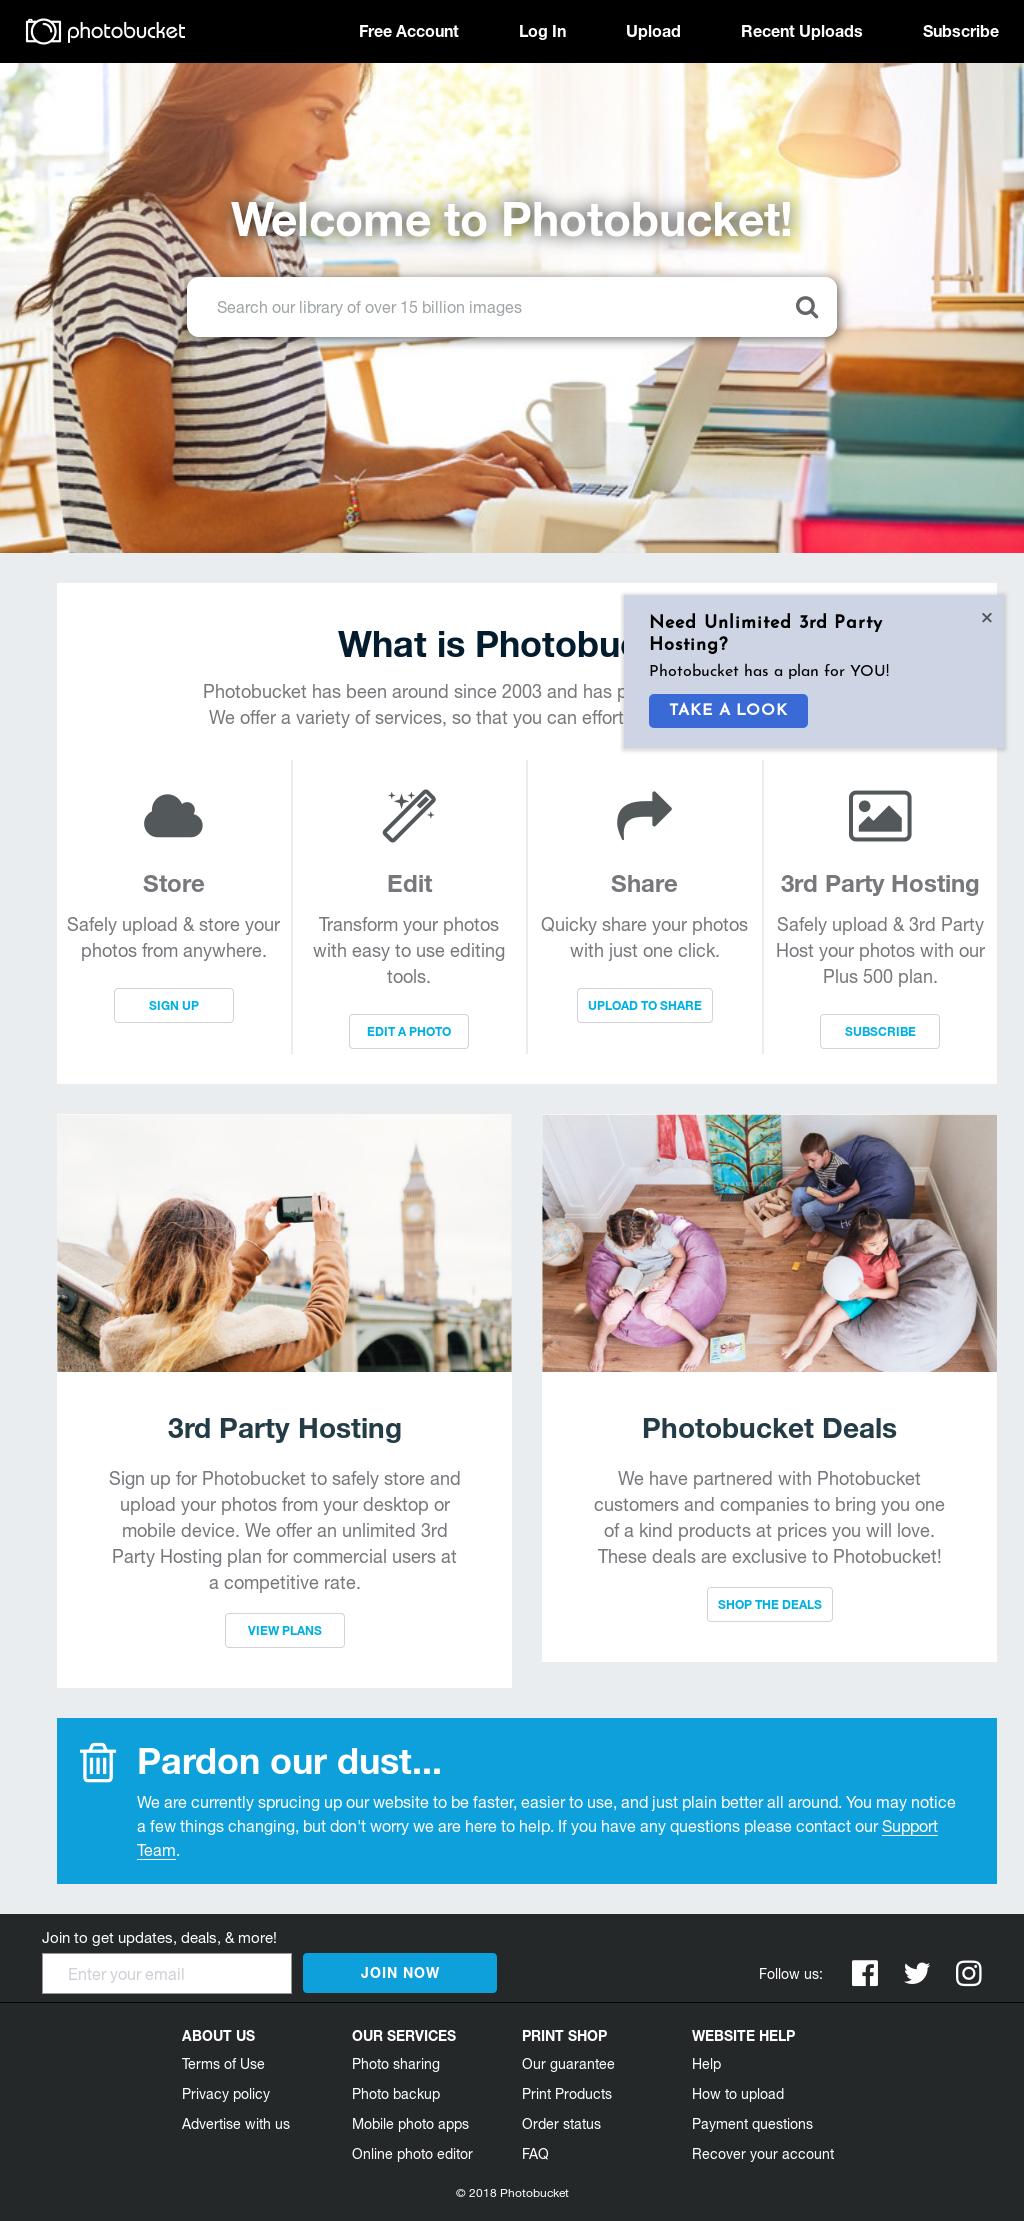 Photobucket Competitors, Revenue and Employees - Owler Company Profile